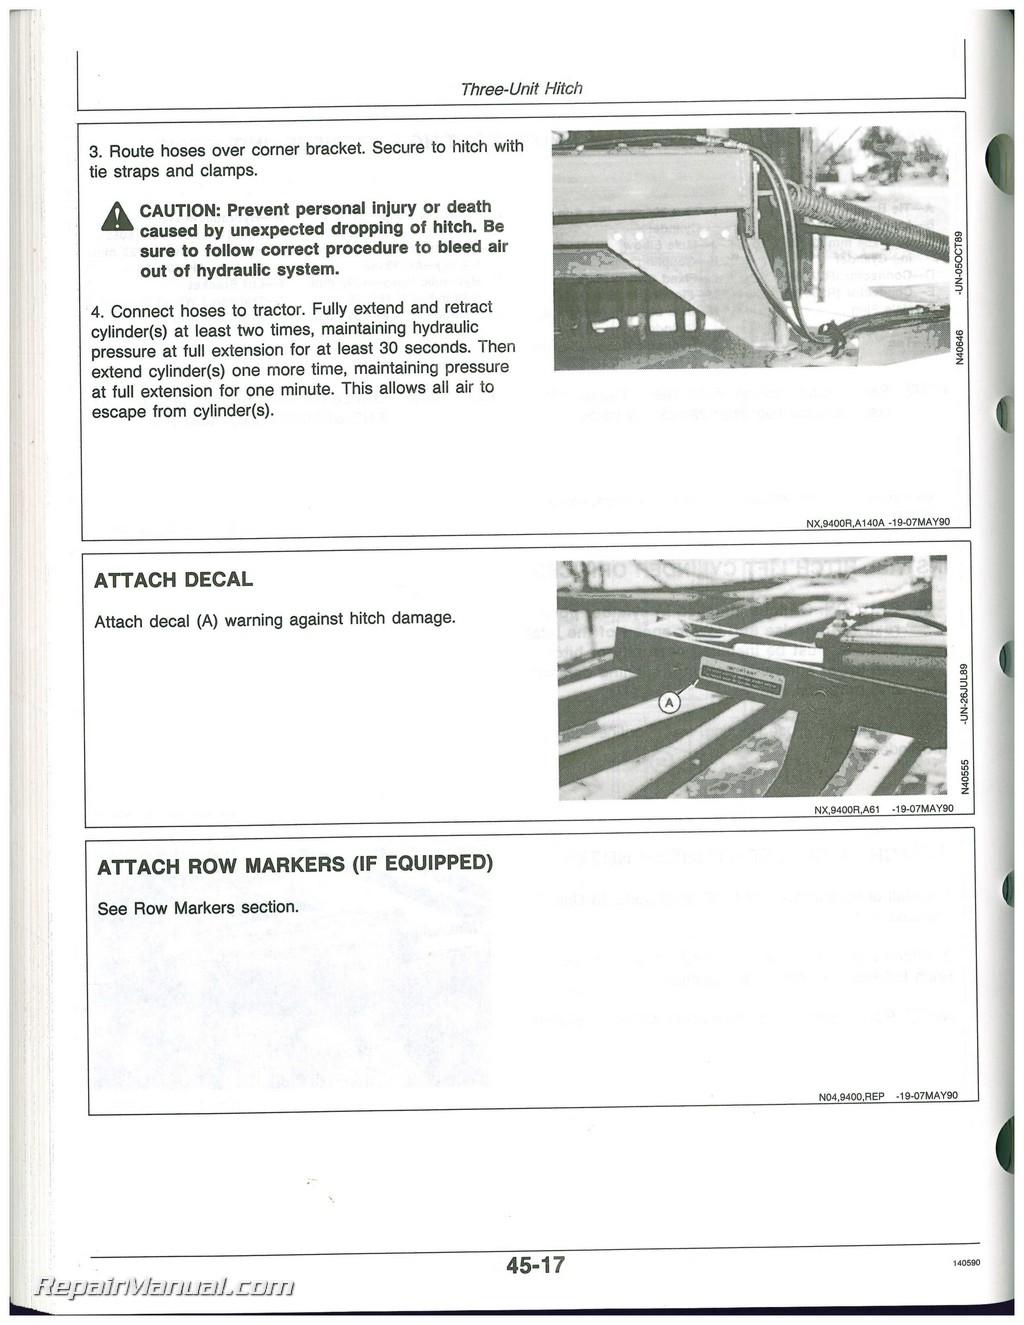 doc repair it instructions